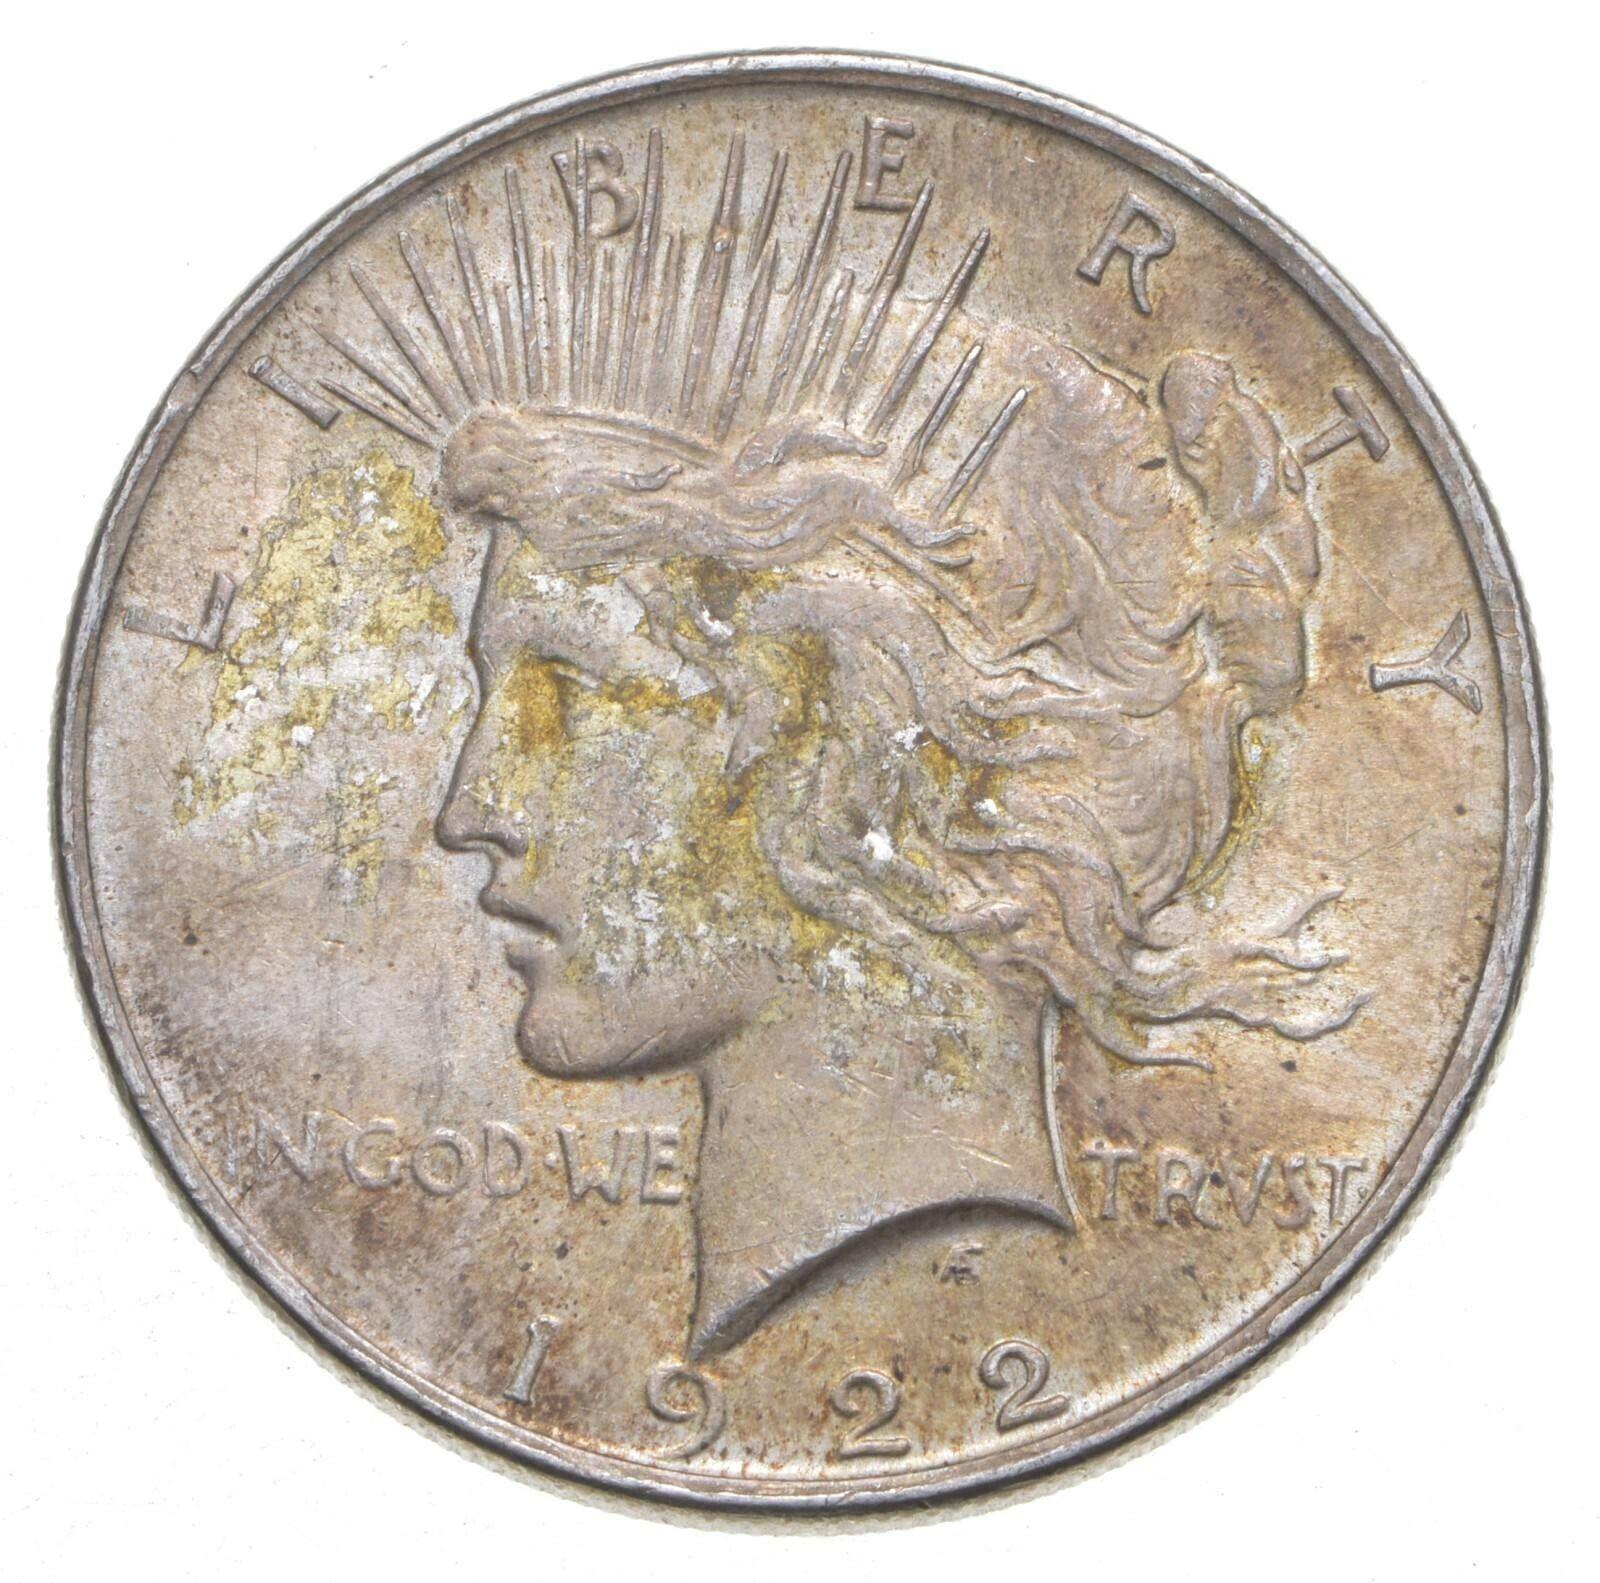 1922 Peace Silver Dollar - US Coin 154 - $24.72